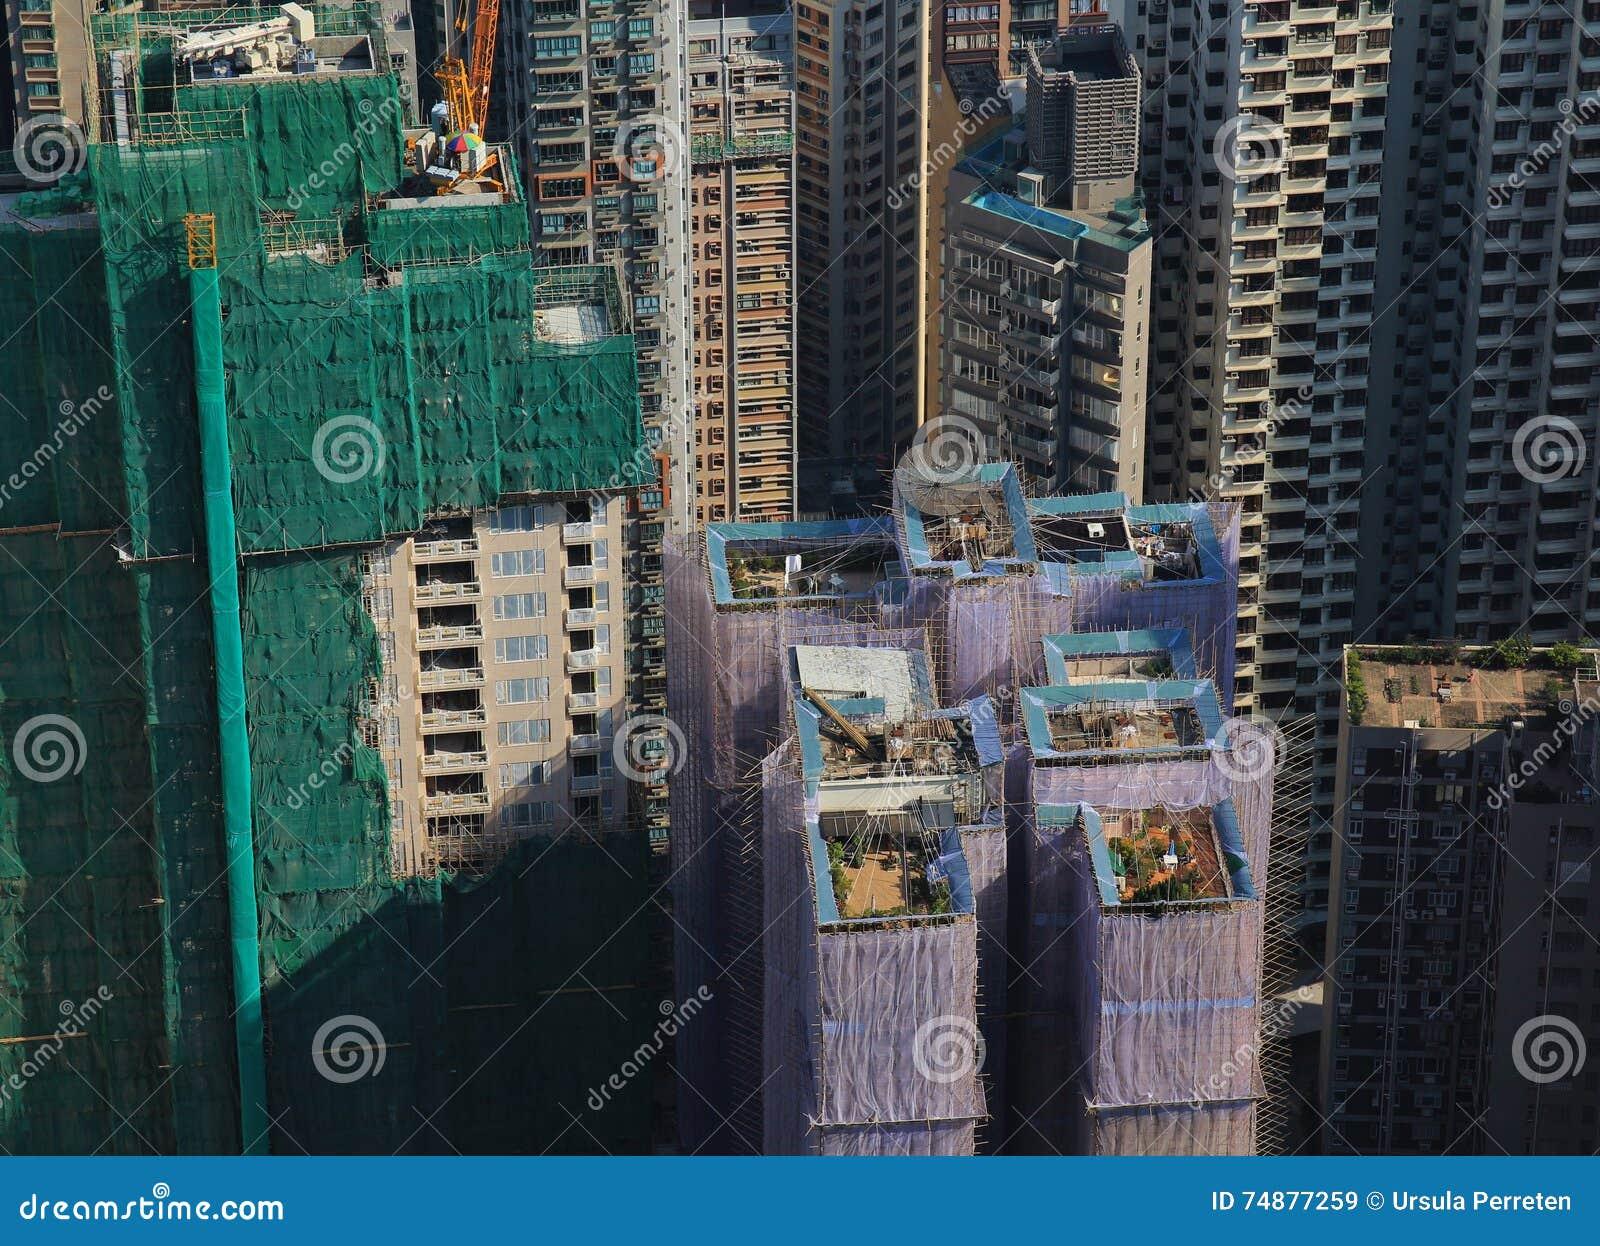 Rooftop gardens in Hong Kong